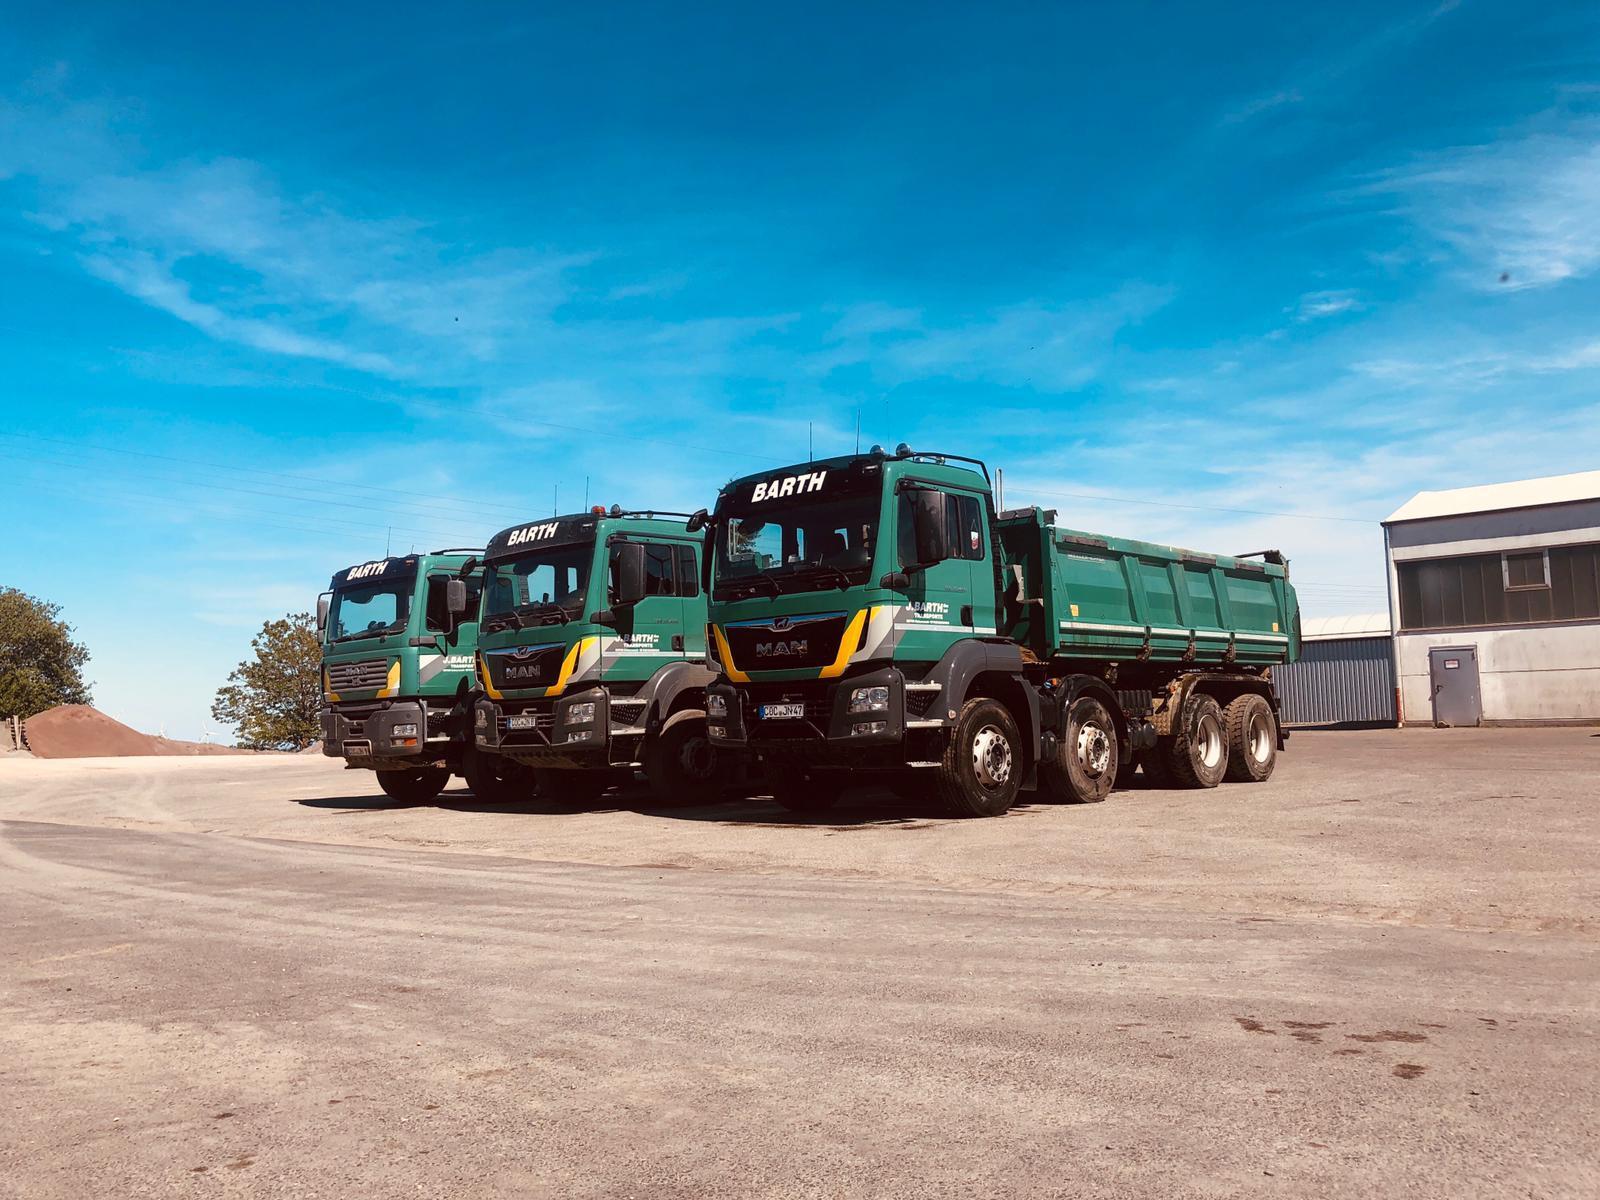 Josef Barth GmbH - Transporte